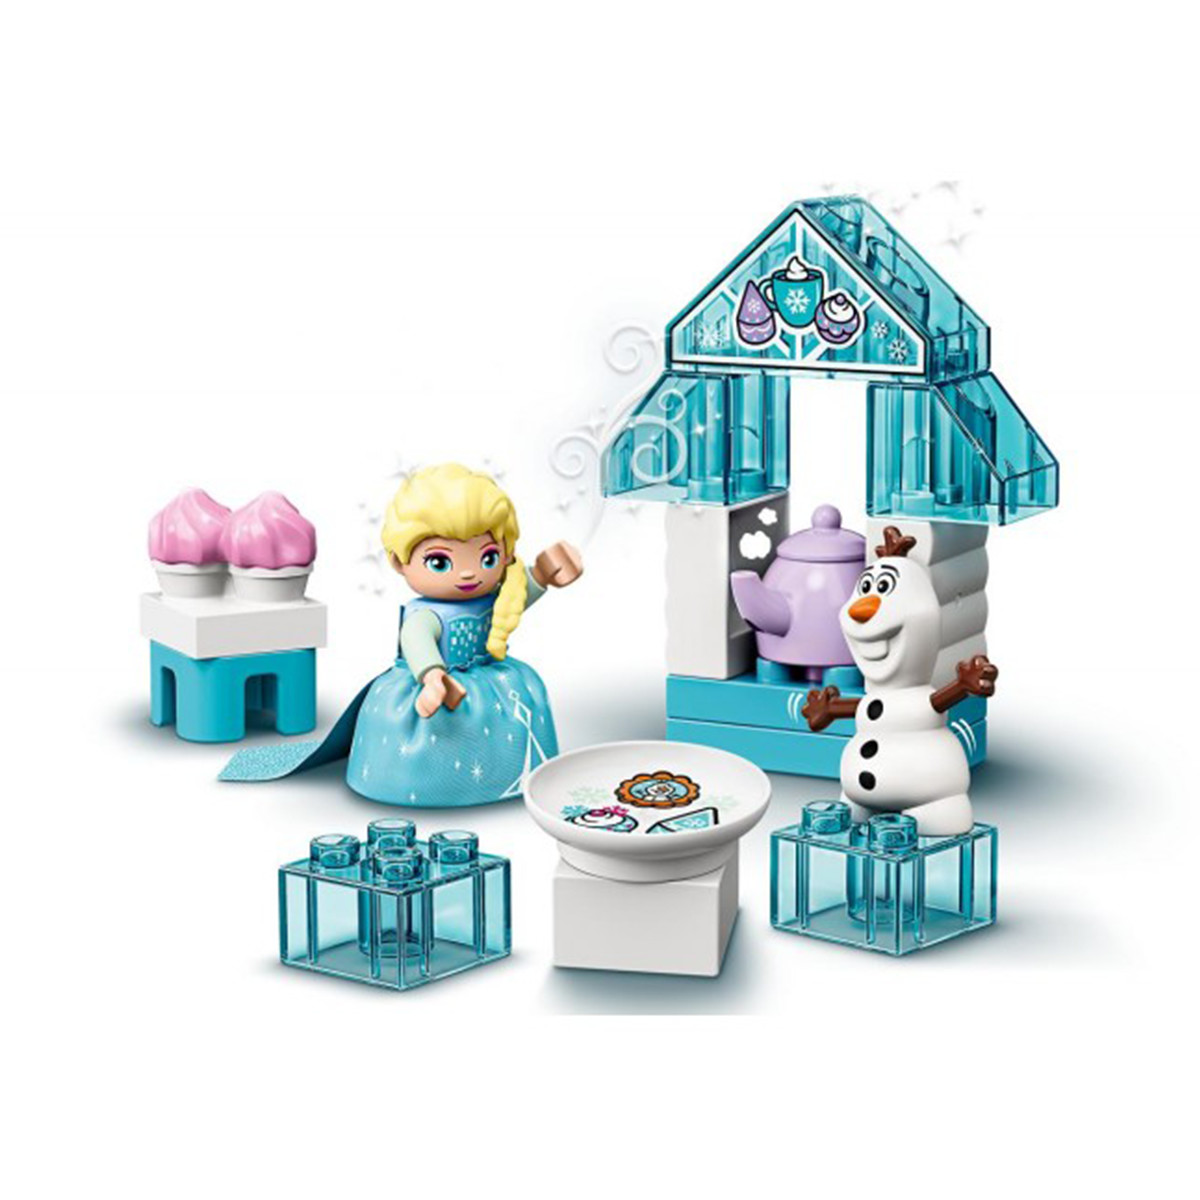 LEGO ELSA AND  OLAF'S TEA PARTY 10920